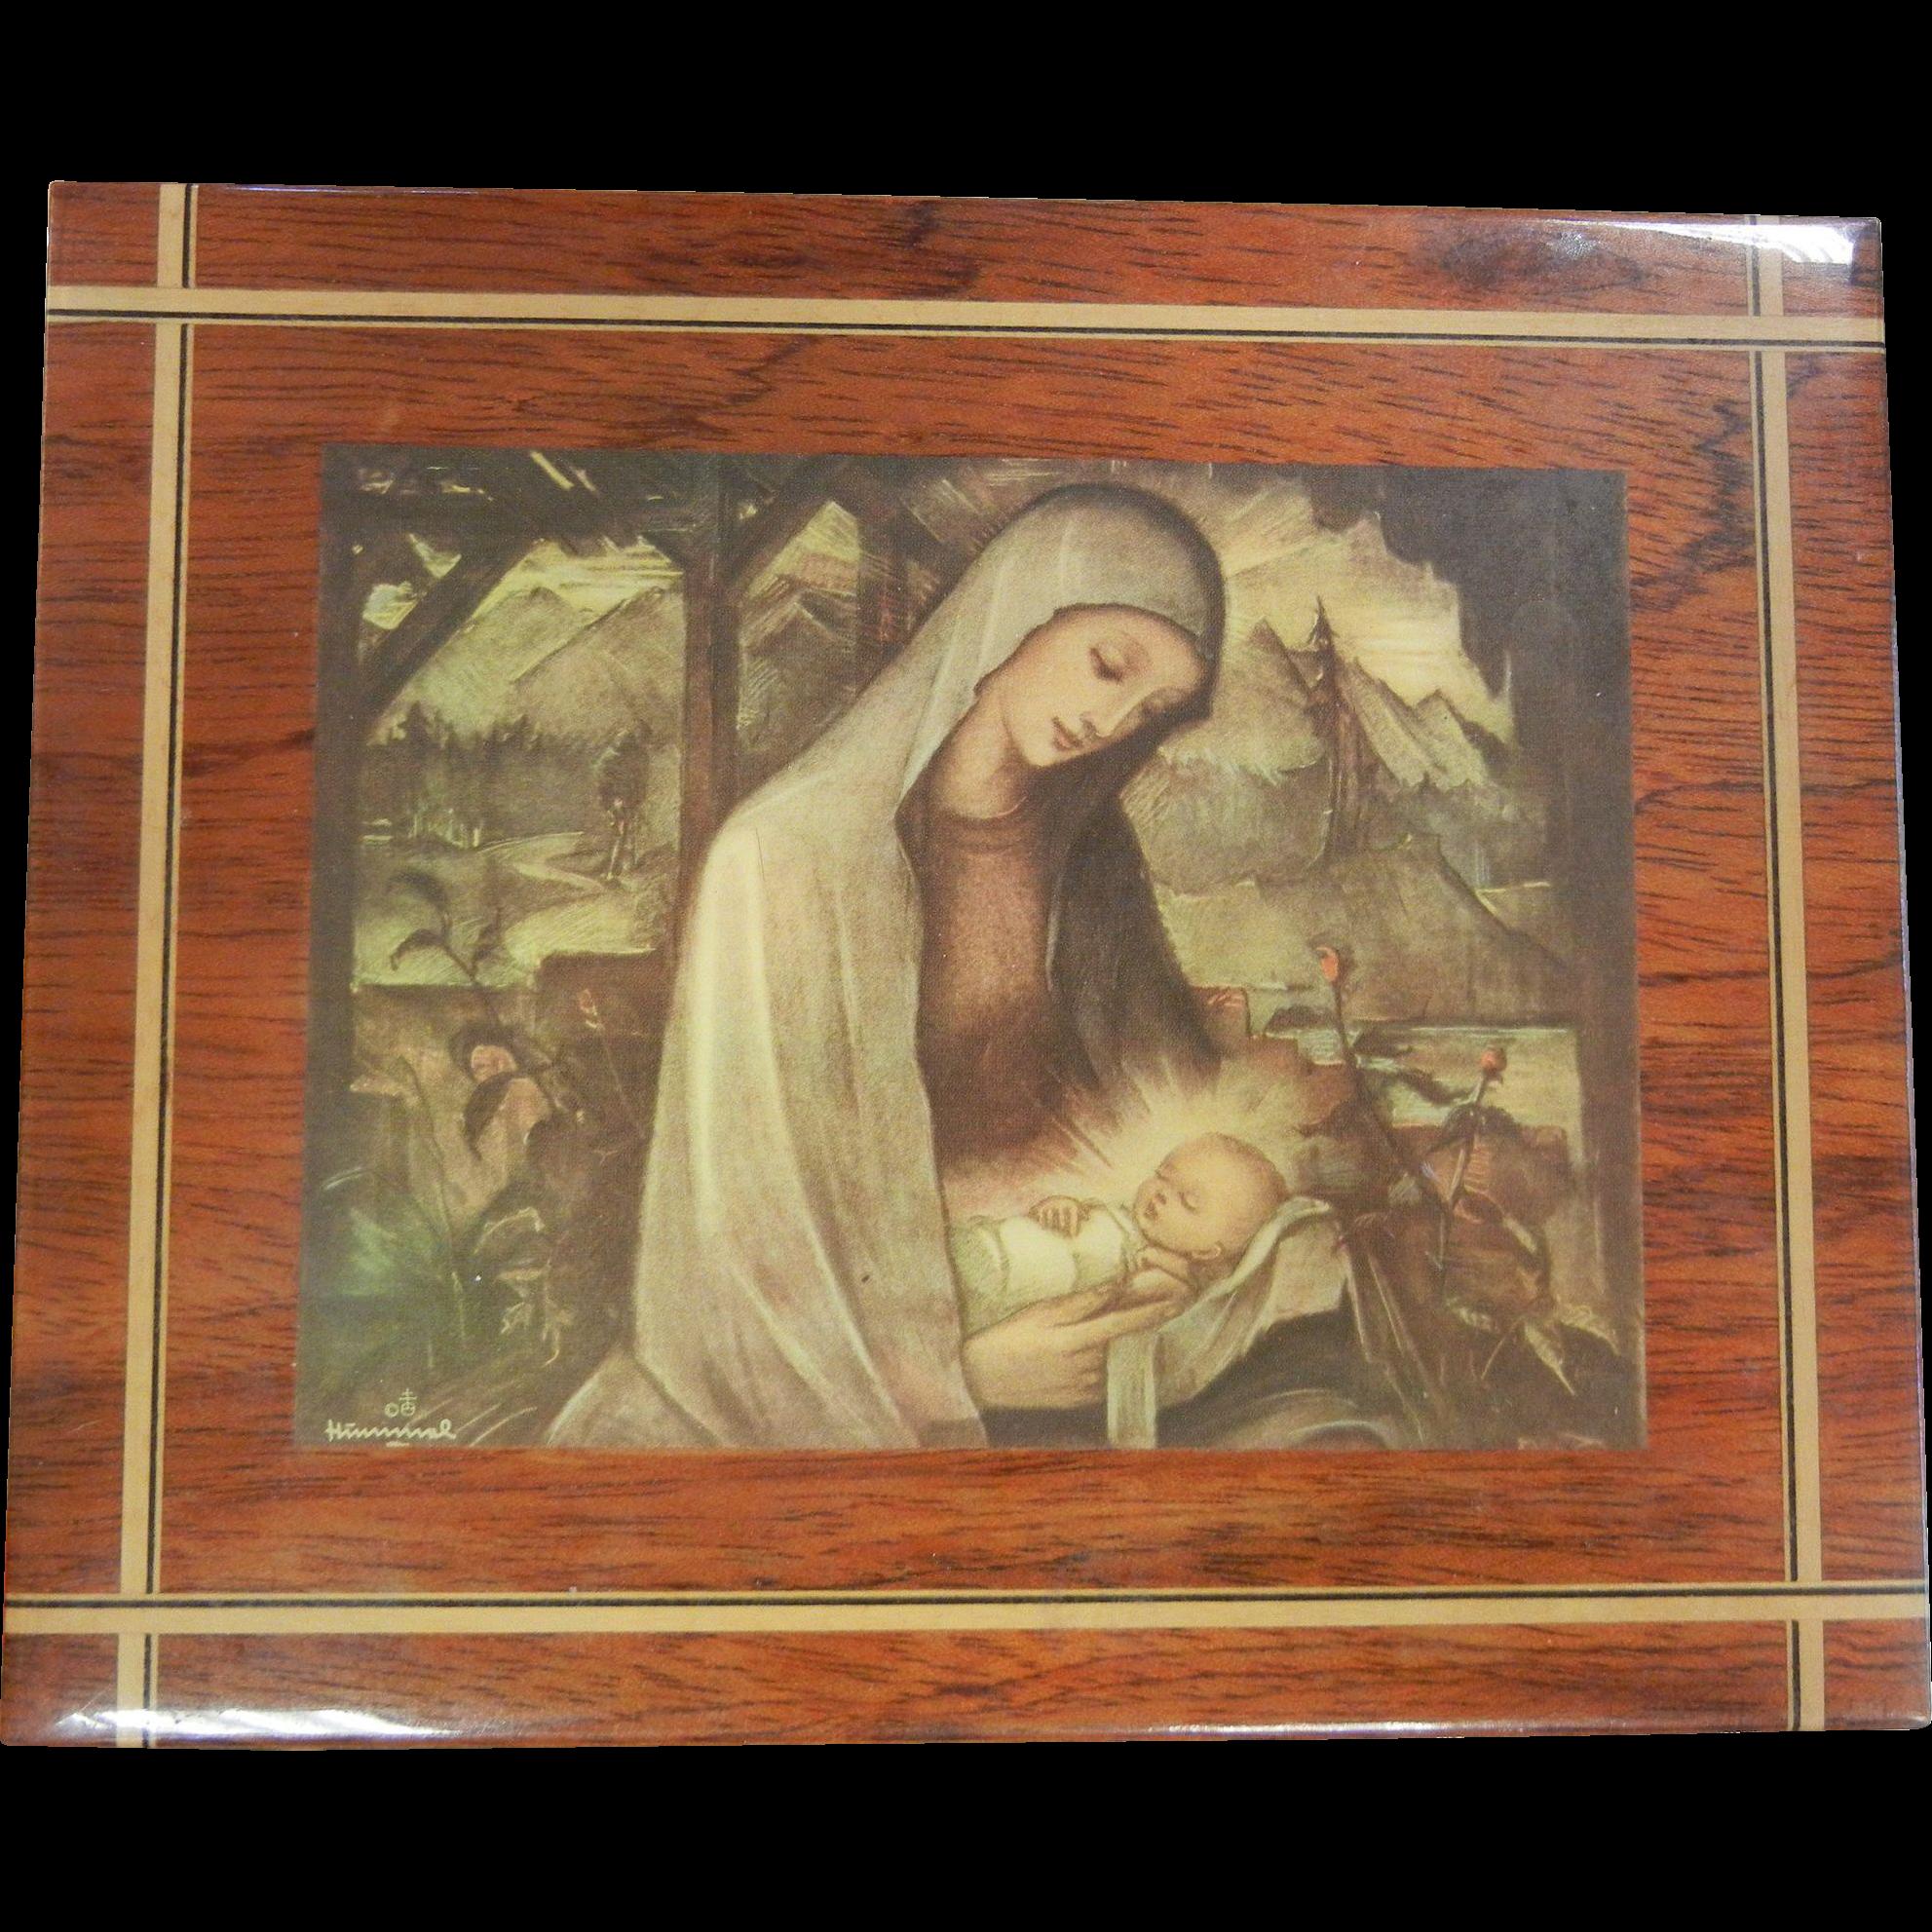 Beautiful Hummel Musical Jewelry Box - Ave Maria